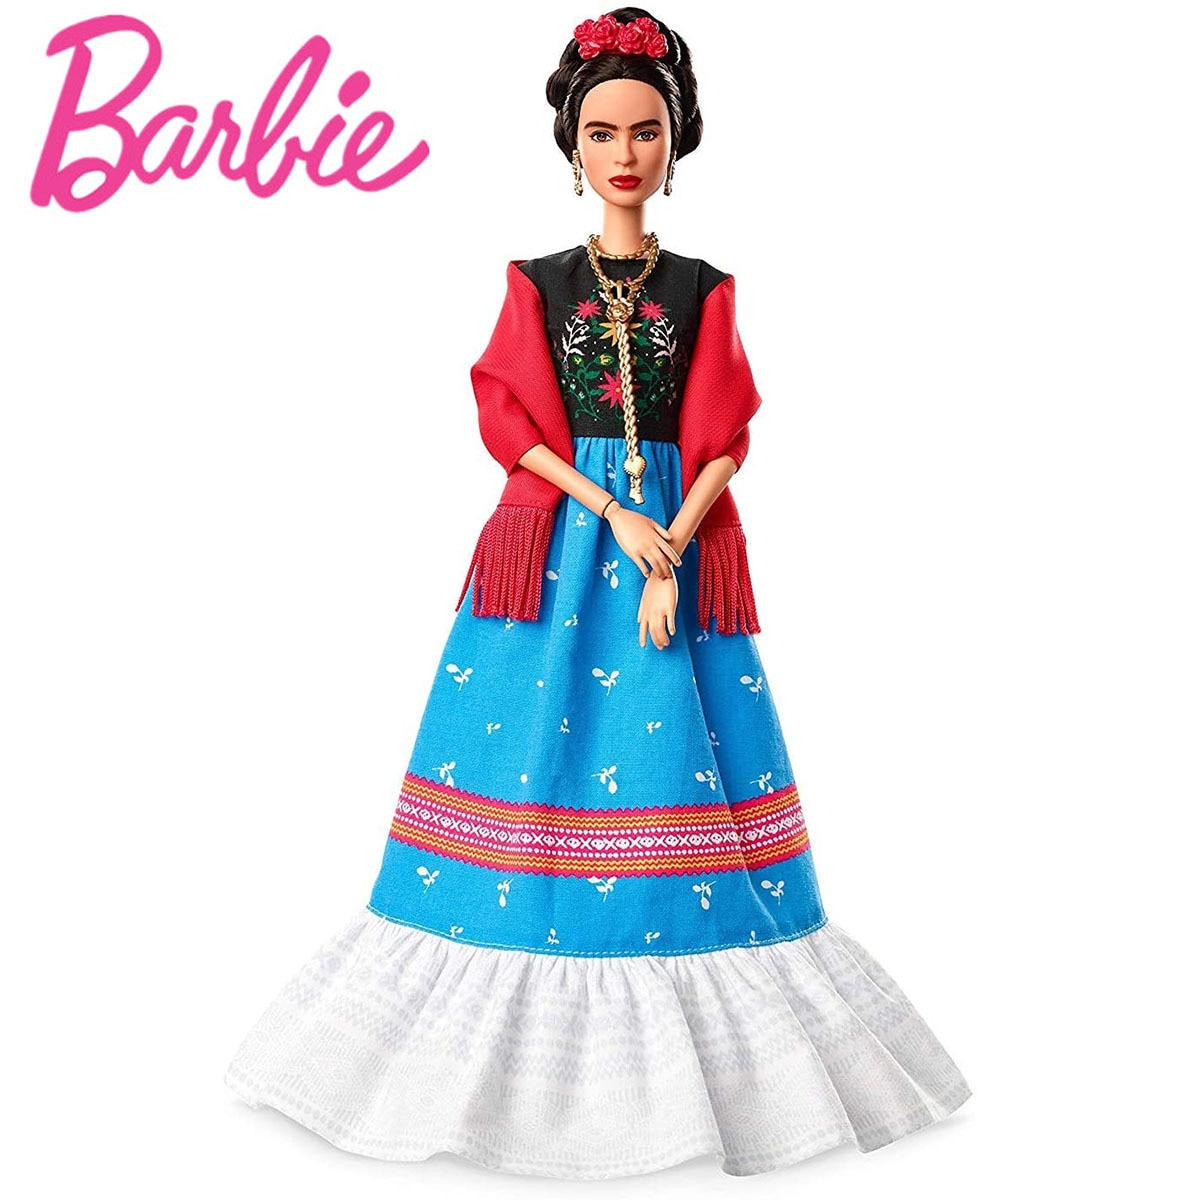 Barbie, inspirando a las mujeres Series Aviator Amelia Earhart pintor Frida Kahlo...